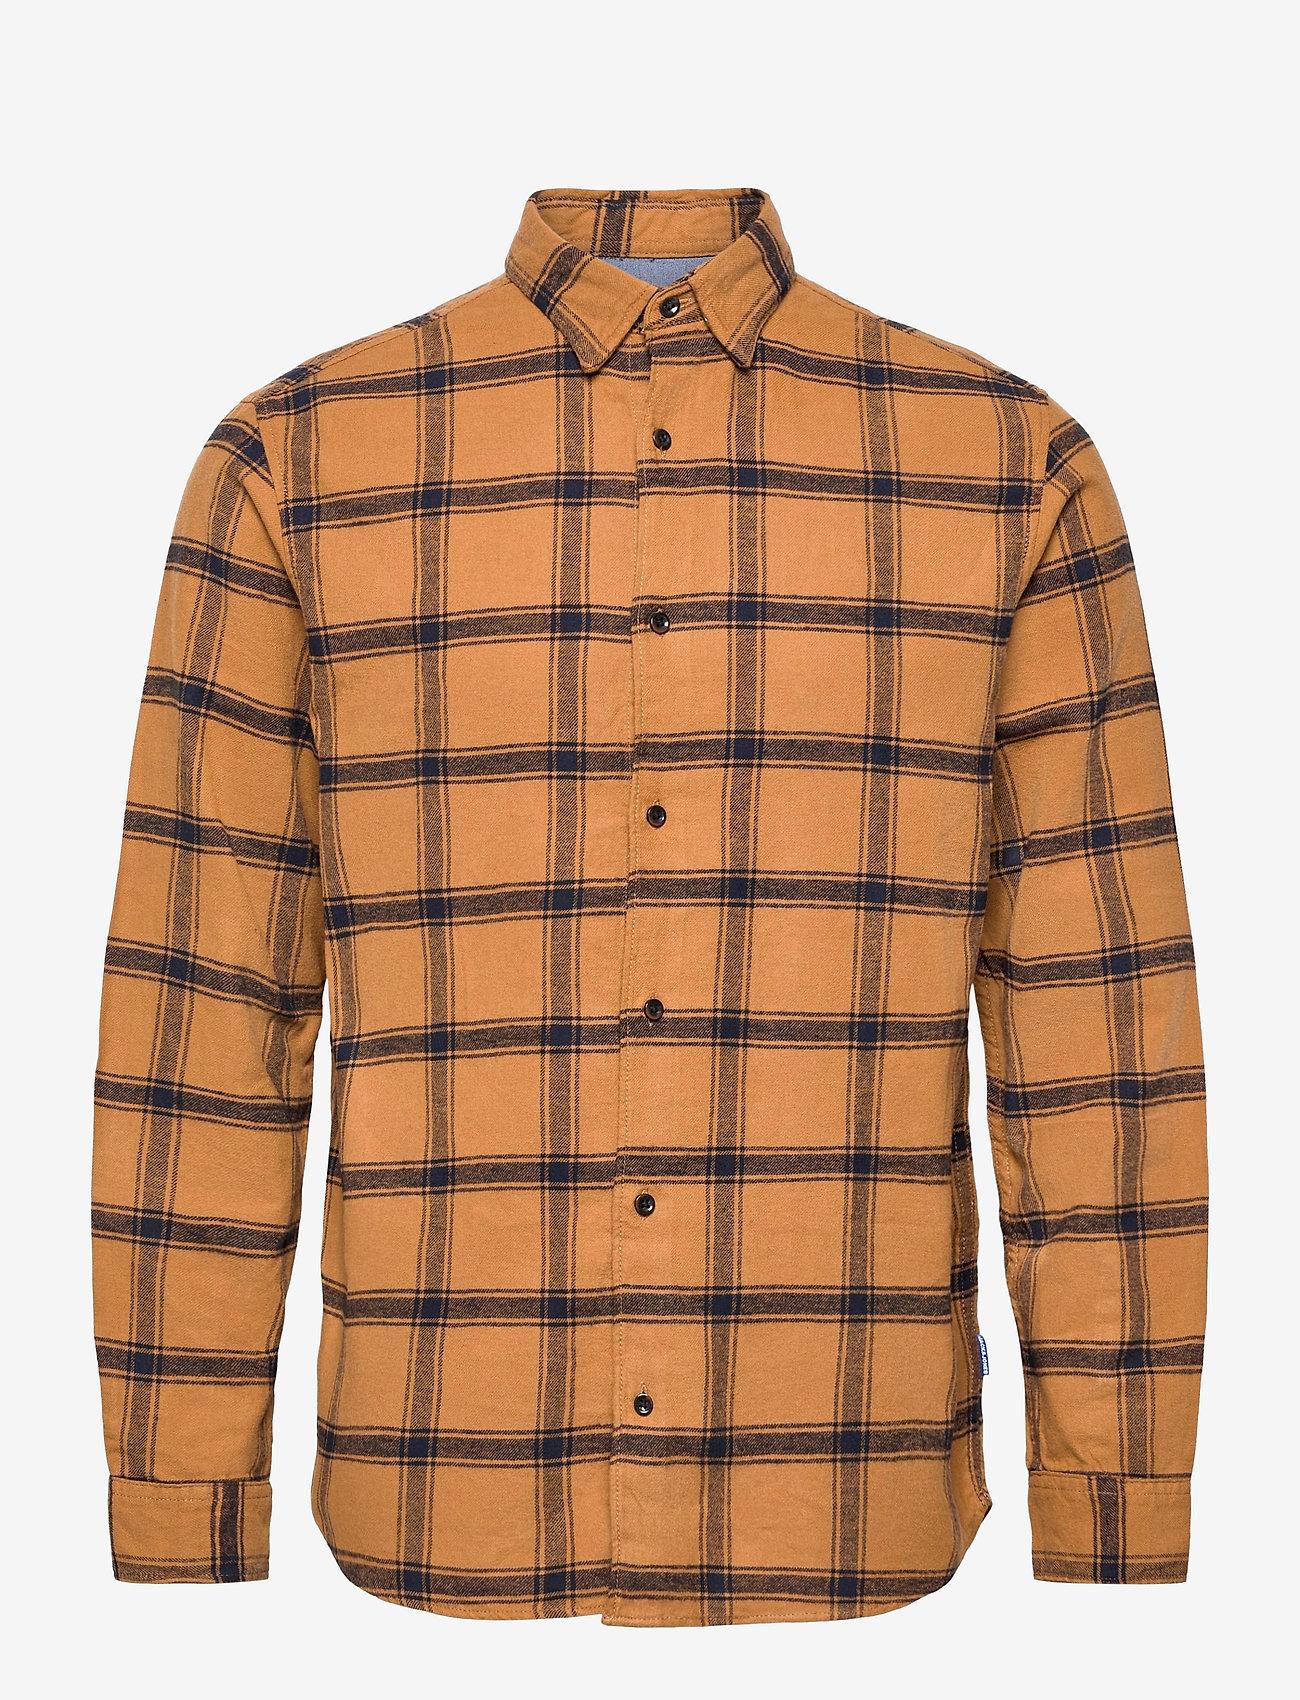 Jack & Jones - JORJAN SHIRT LS - rutiga skjortor - rubber - 0